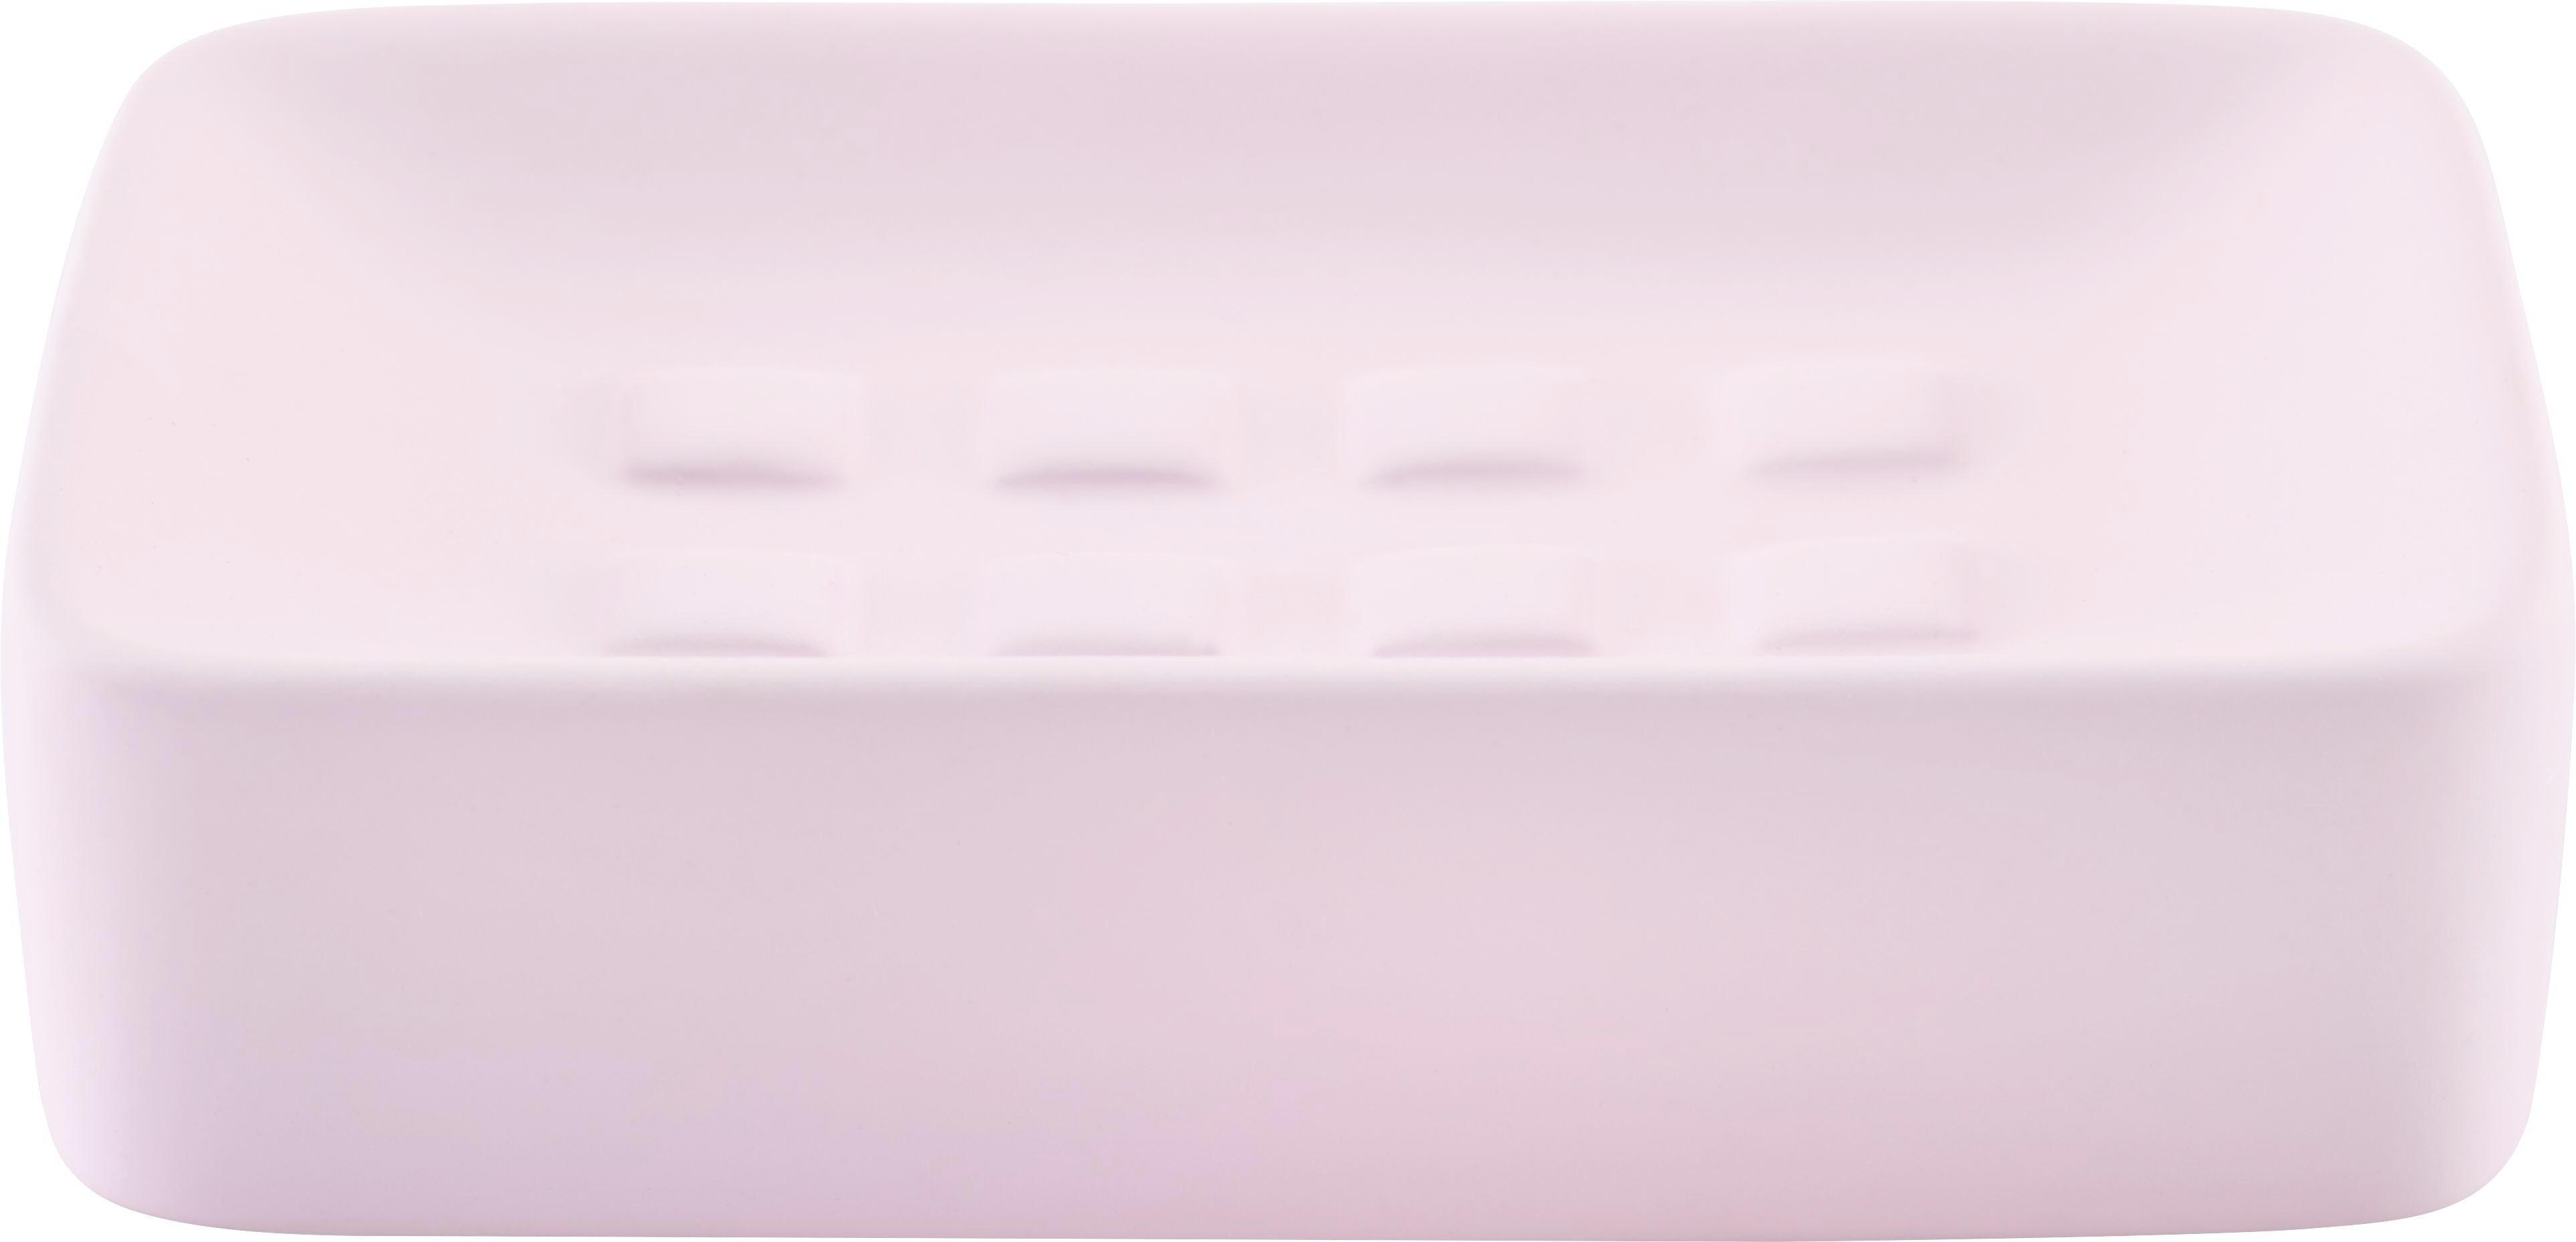 Seifenschale Carina in Rosa aus Keramik - Rosa, Keramik (8,3/12,5cm) - MÖMAX modern living